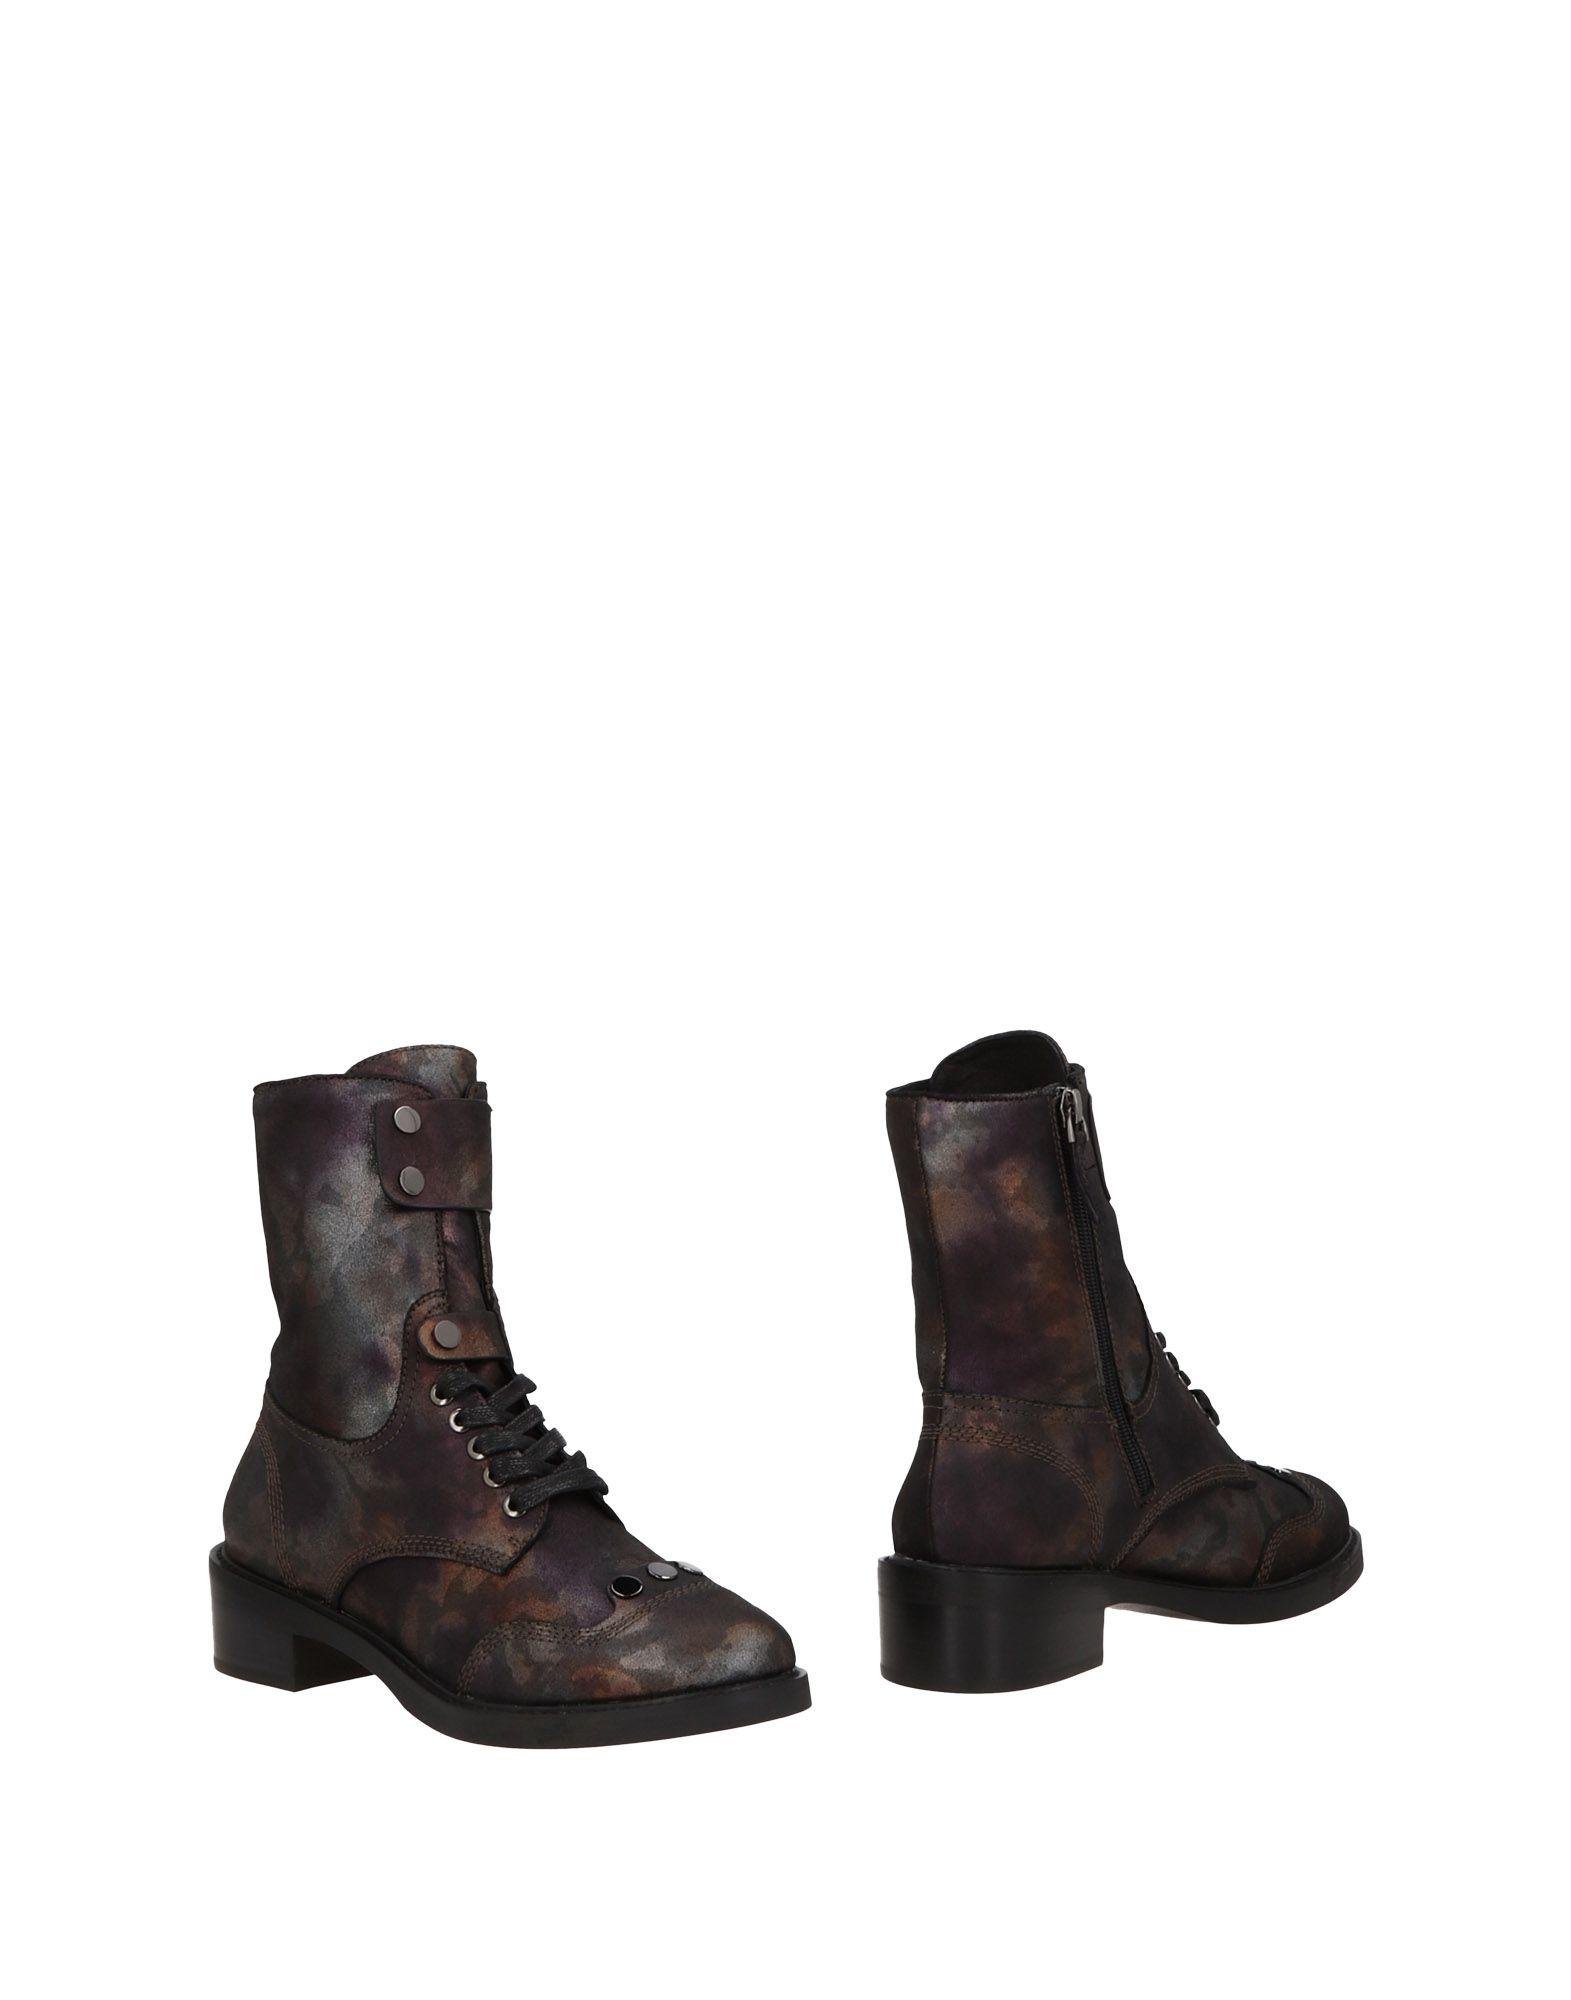 Bottine Lola Cruz Femme - Bottines Lola Cruz Violet Chaussures casual sauvages